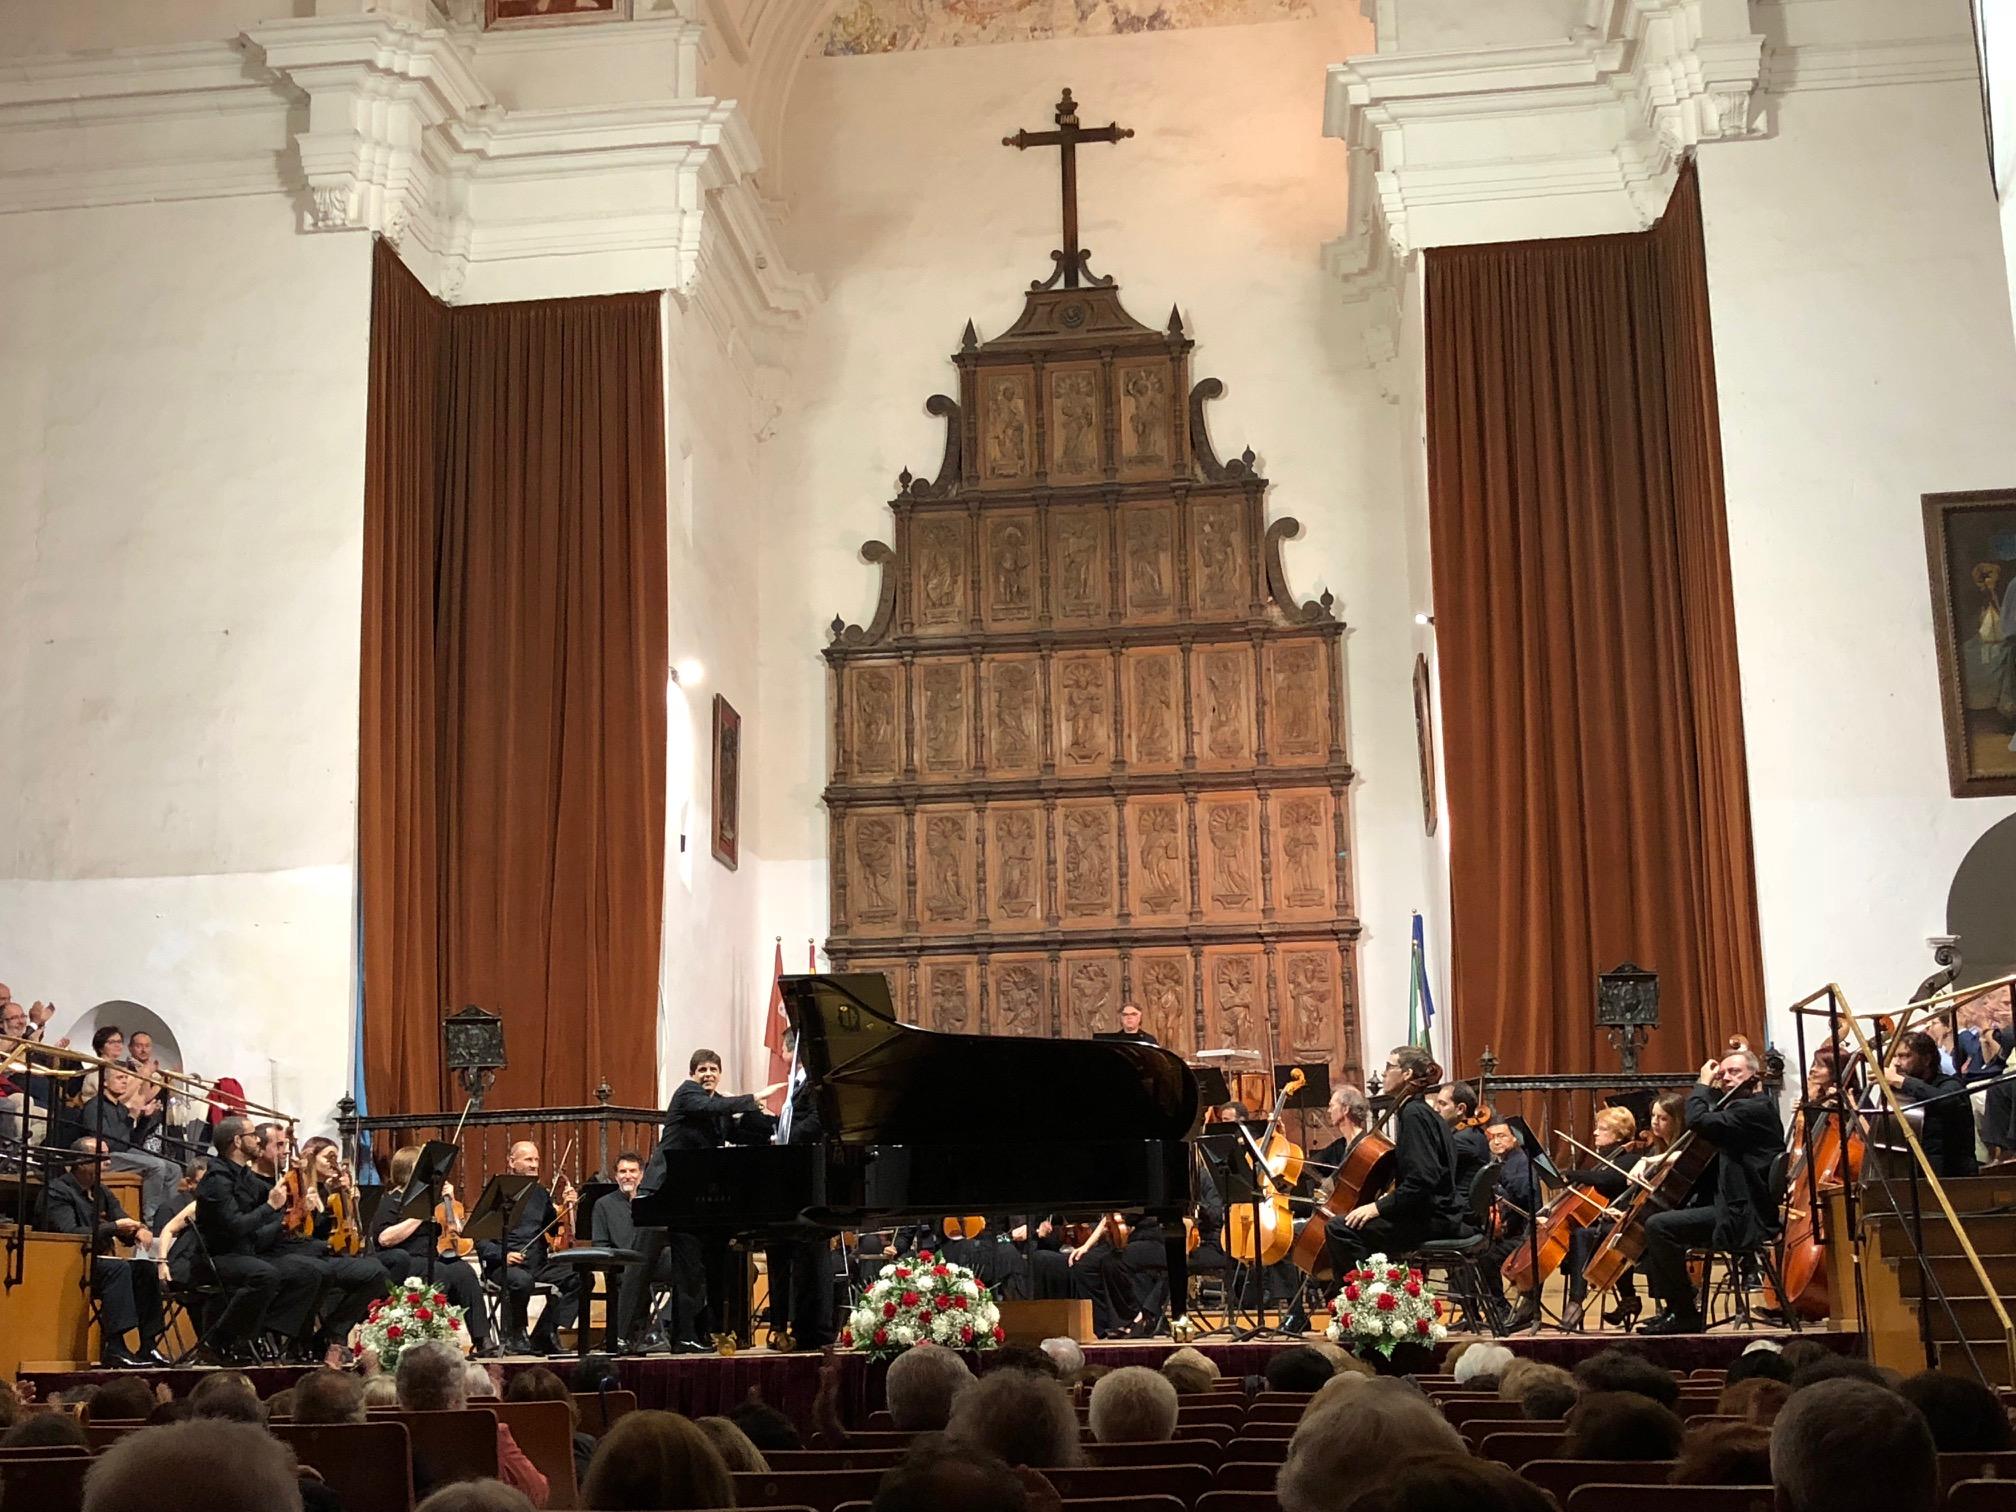 Rattle se despide de la Filarmónica de Berlín con Brahms